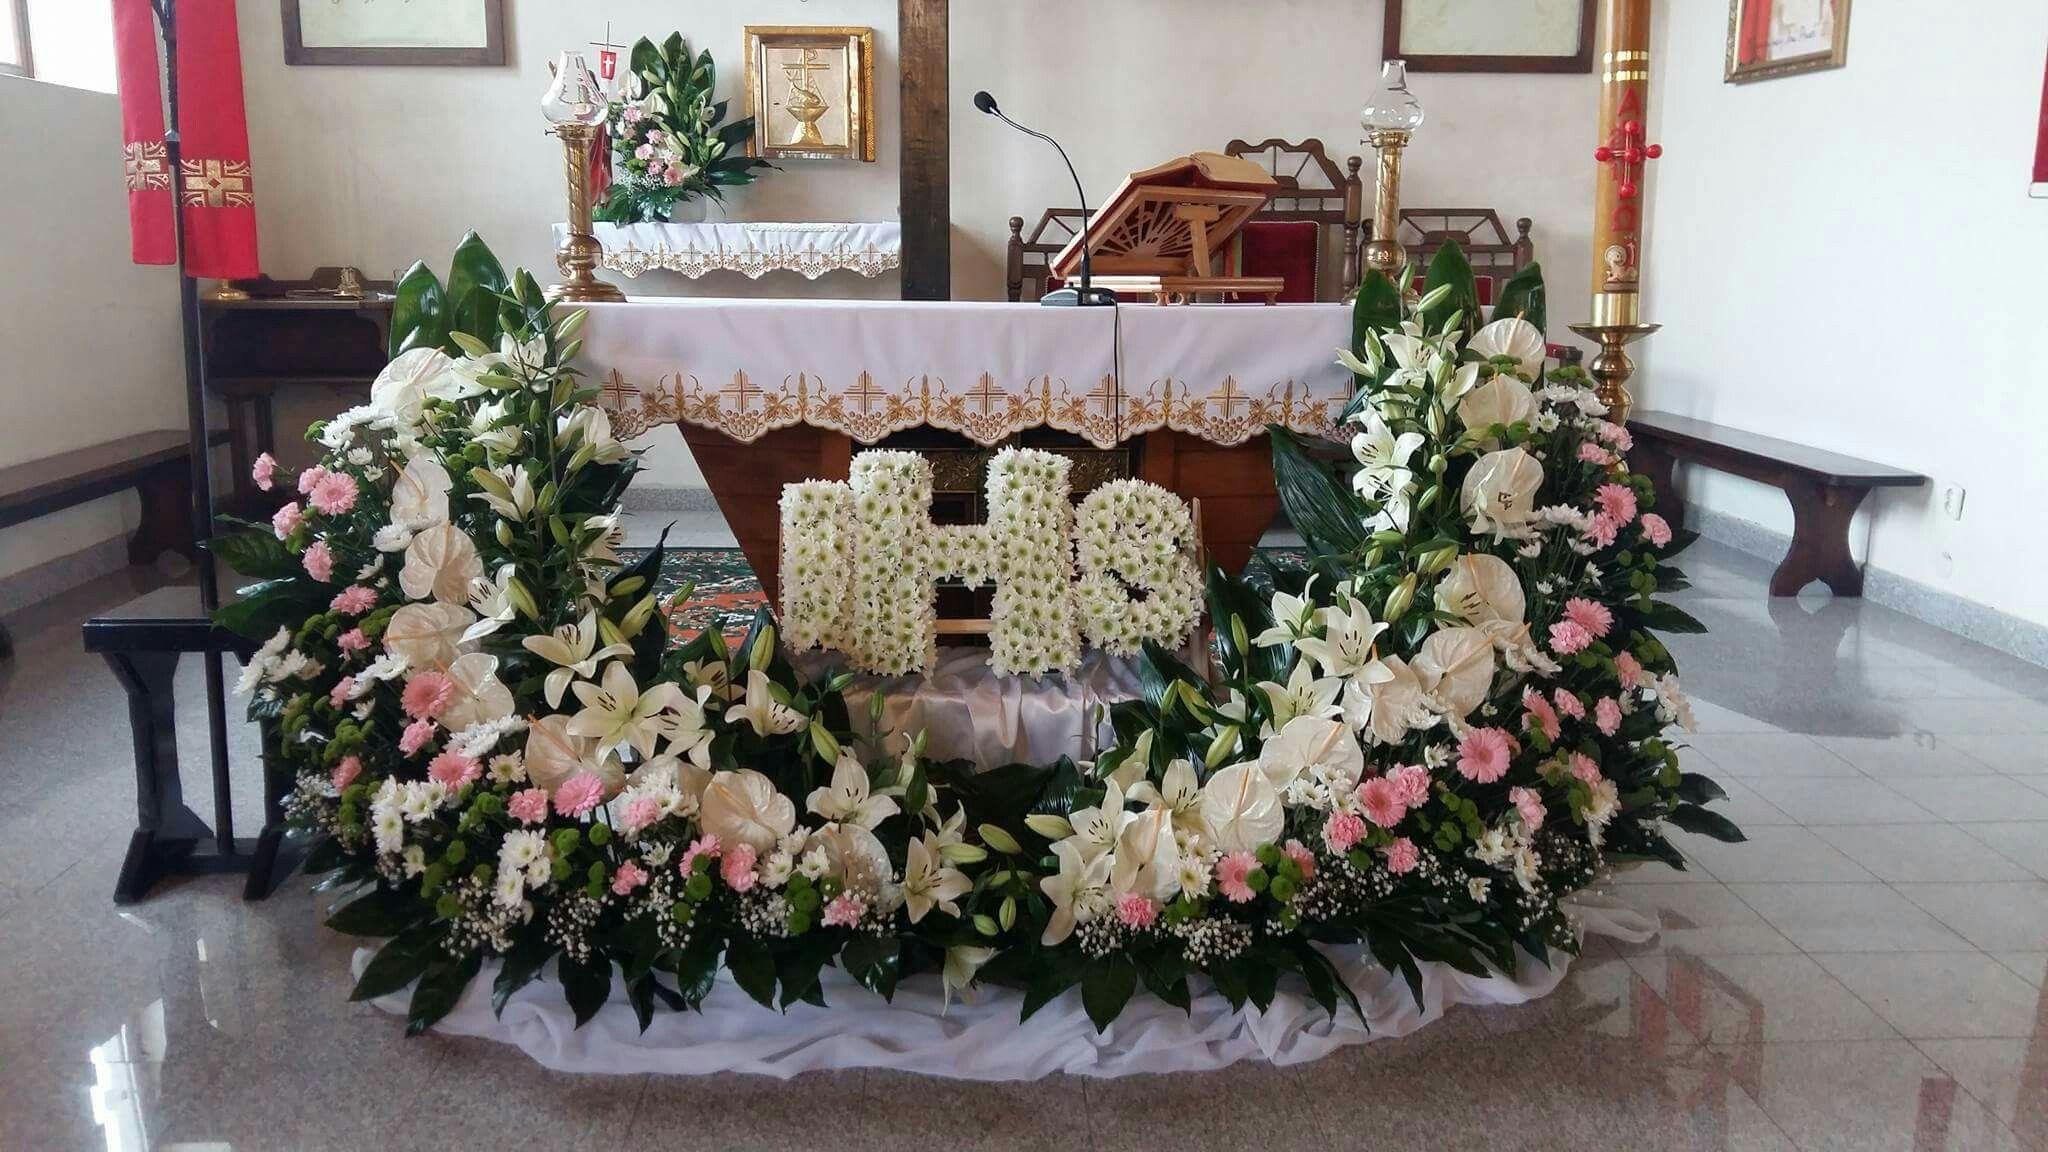 Komunia Sw Dekoracja Kosciola Floral Wreath Floral Decor